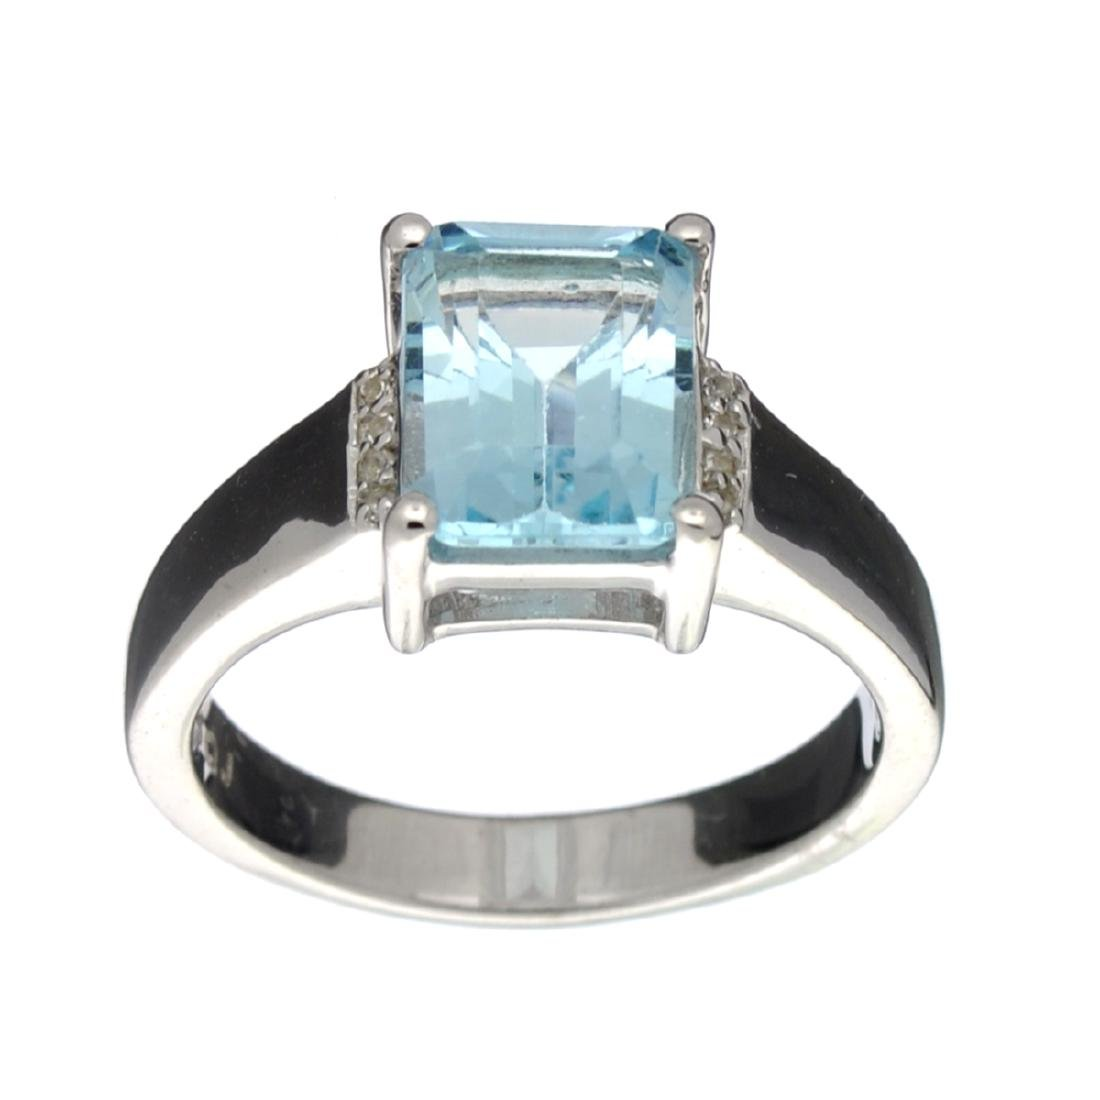 APP: 0.5k Fine Jewelry 3.05CT Blue And White Topaz